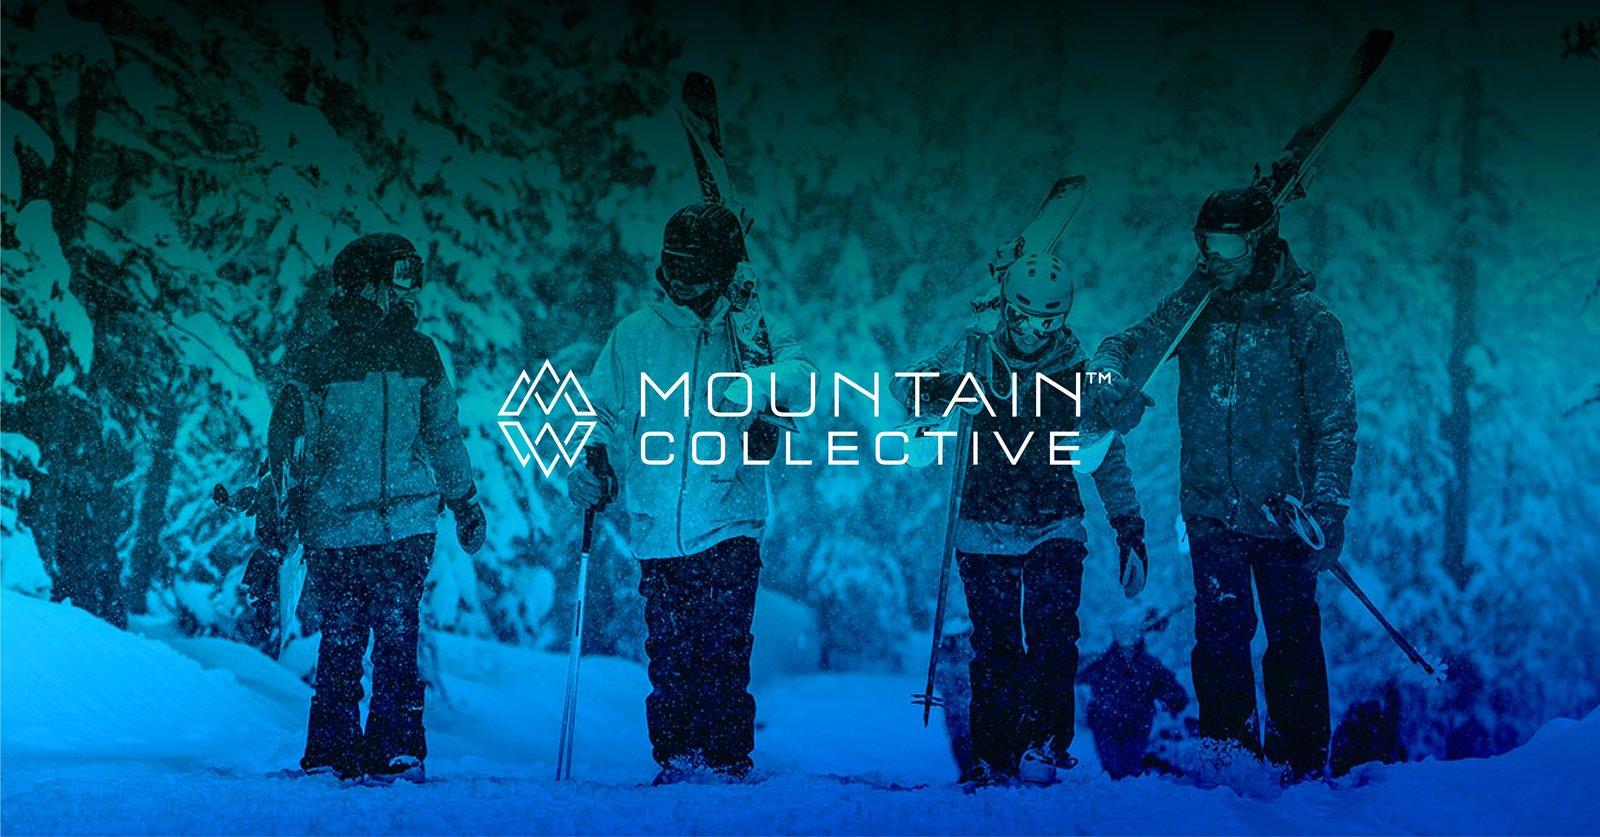 the mountain collective pass niseko united hanazono